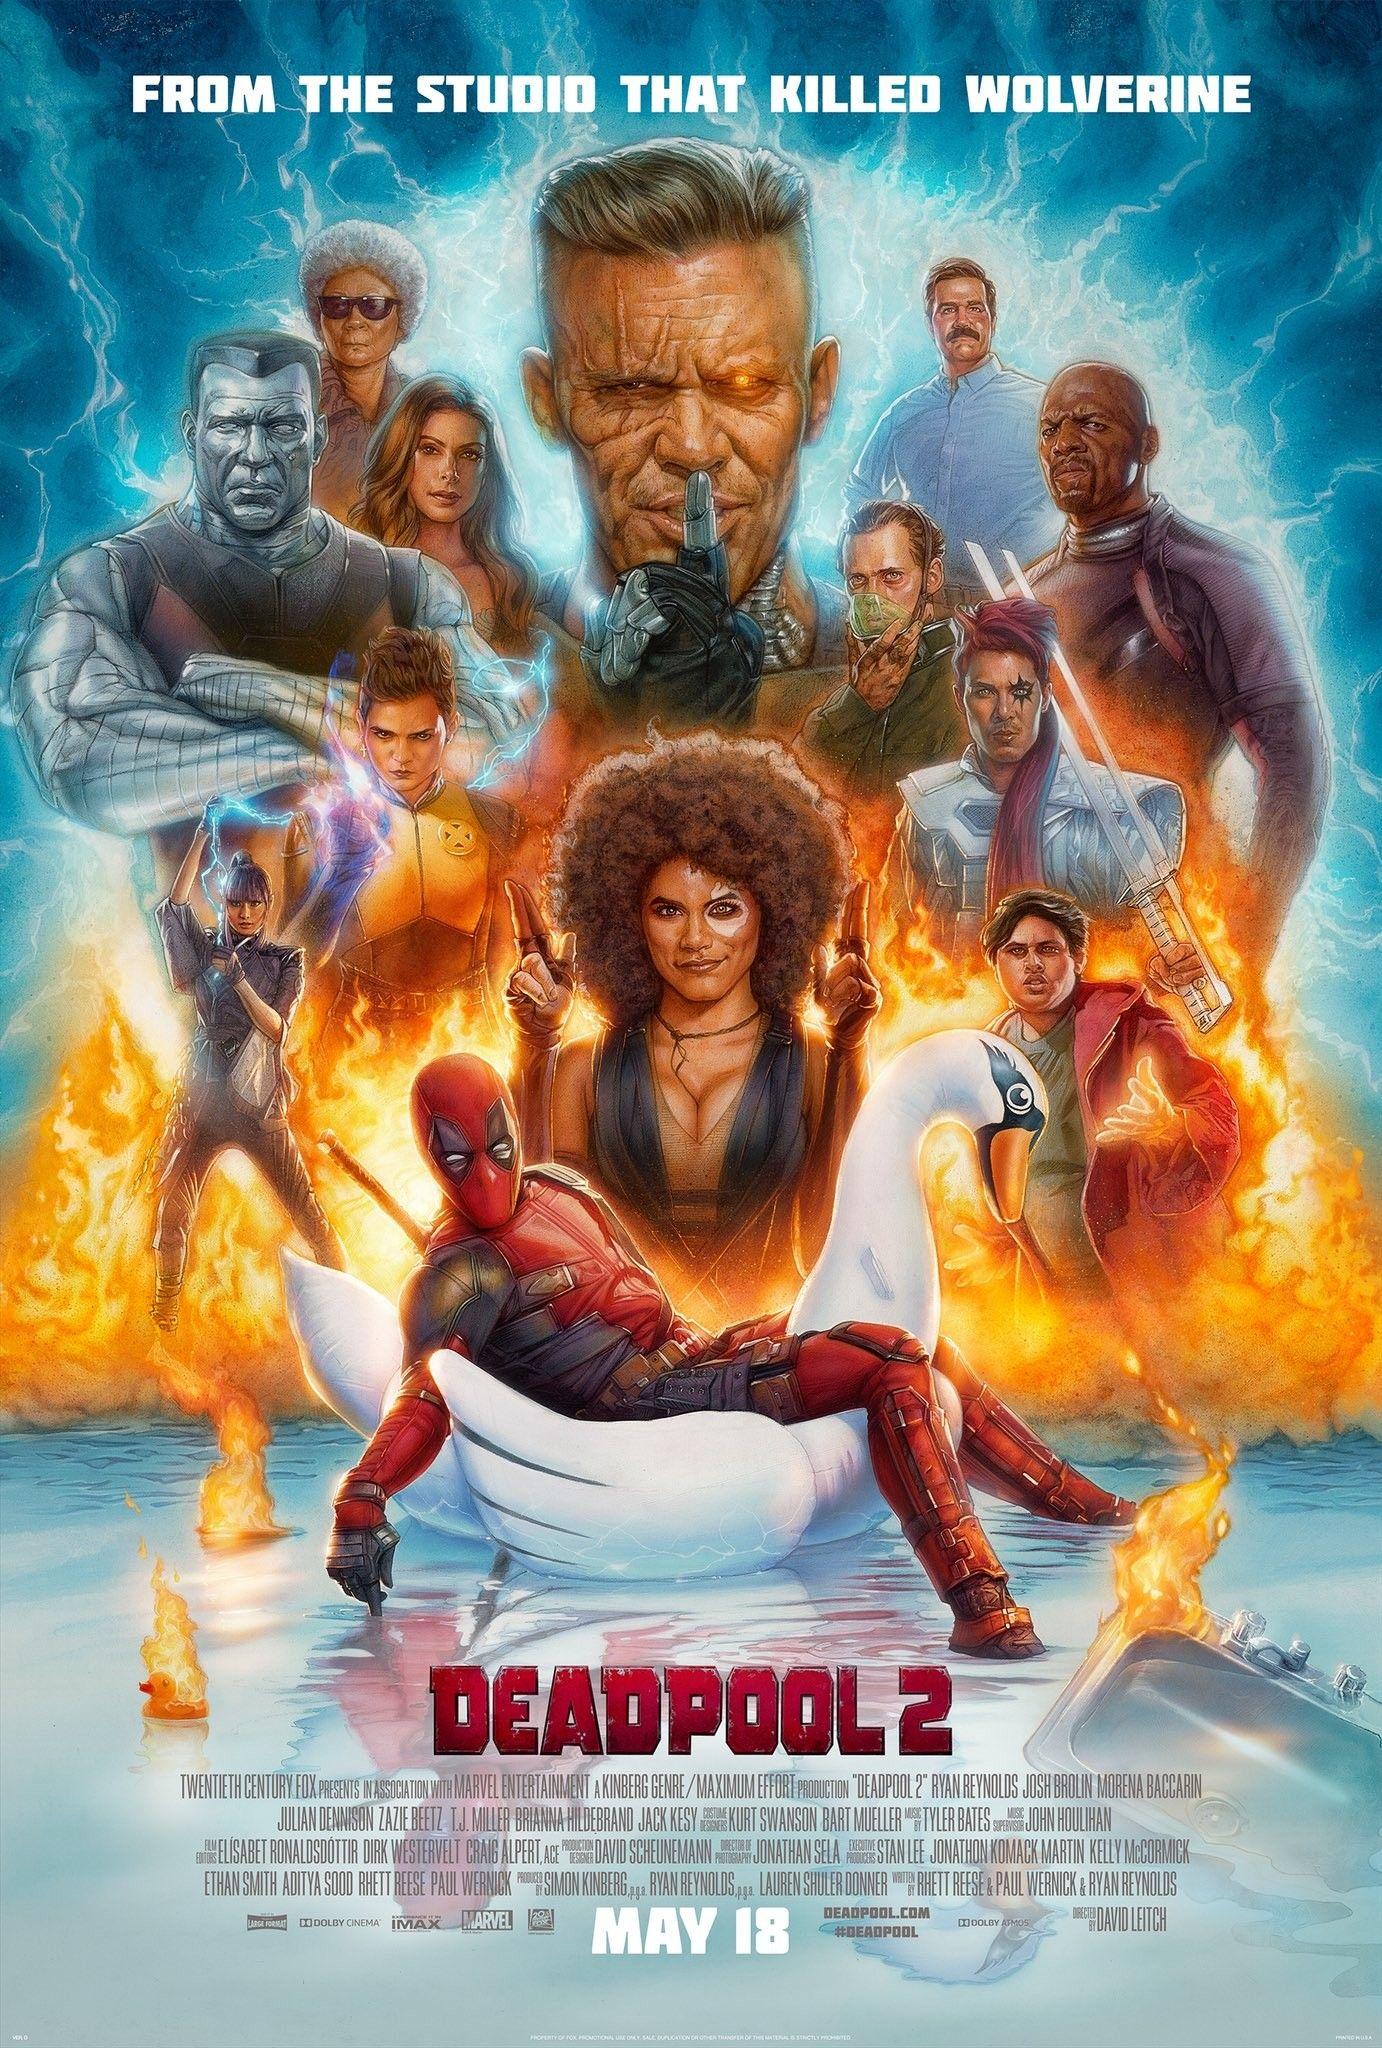 Find Deadpool 2 Movie Tickets Posteres De Filmes Deadpool Marvel Filmes